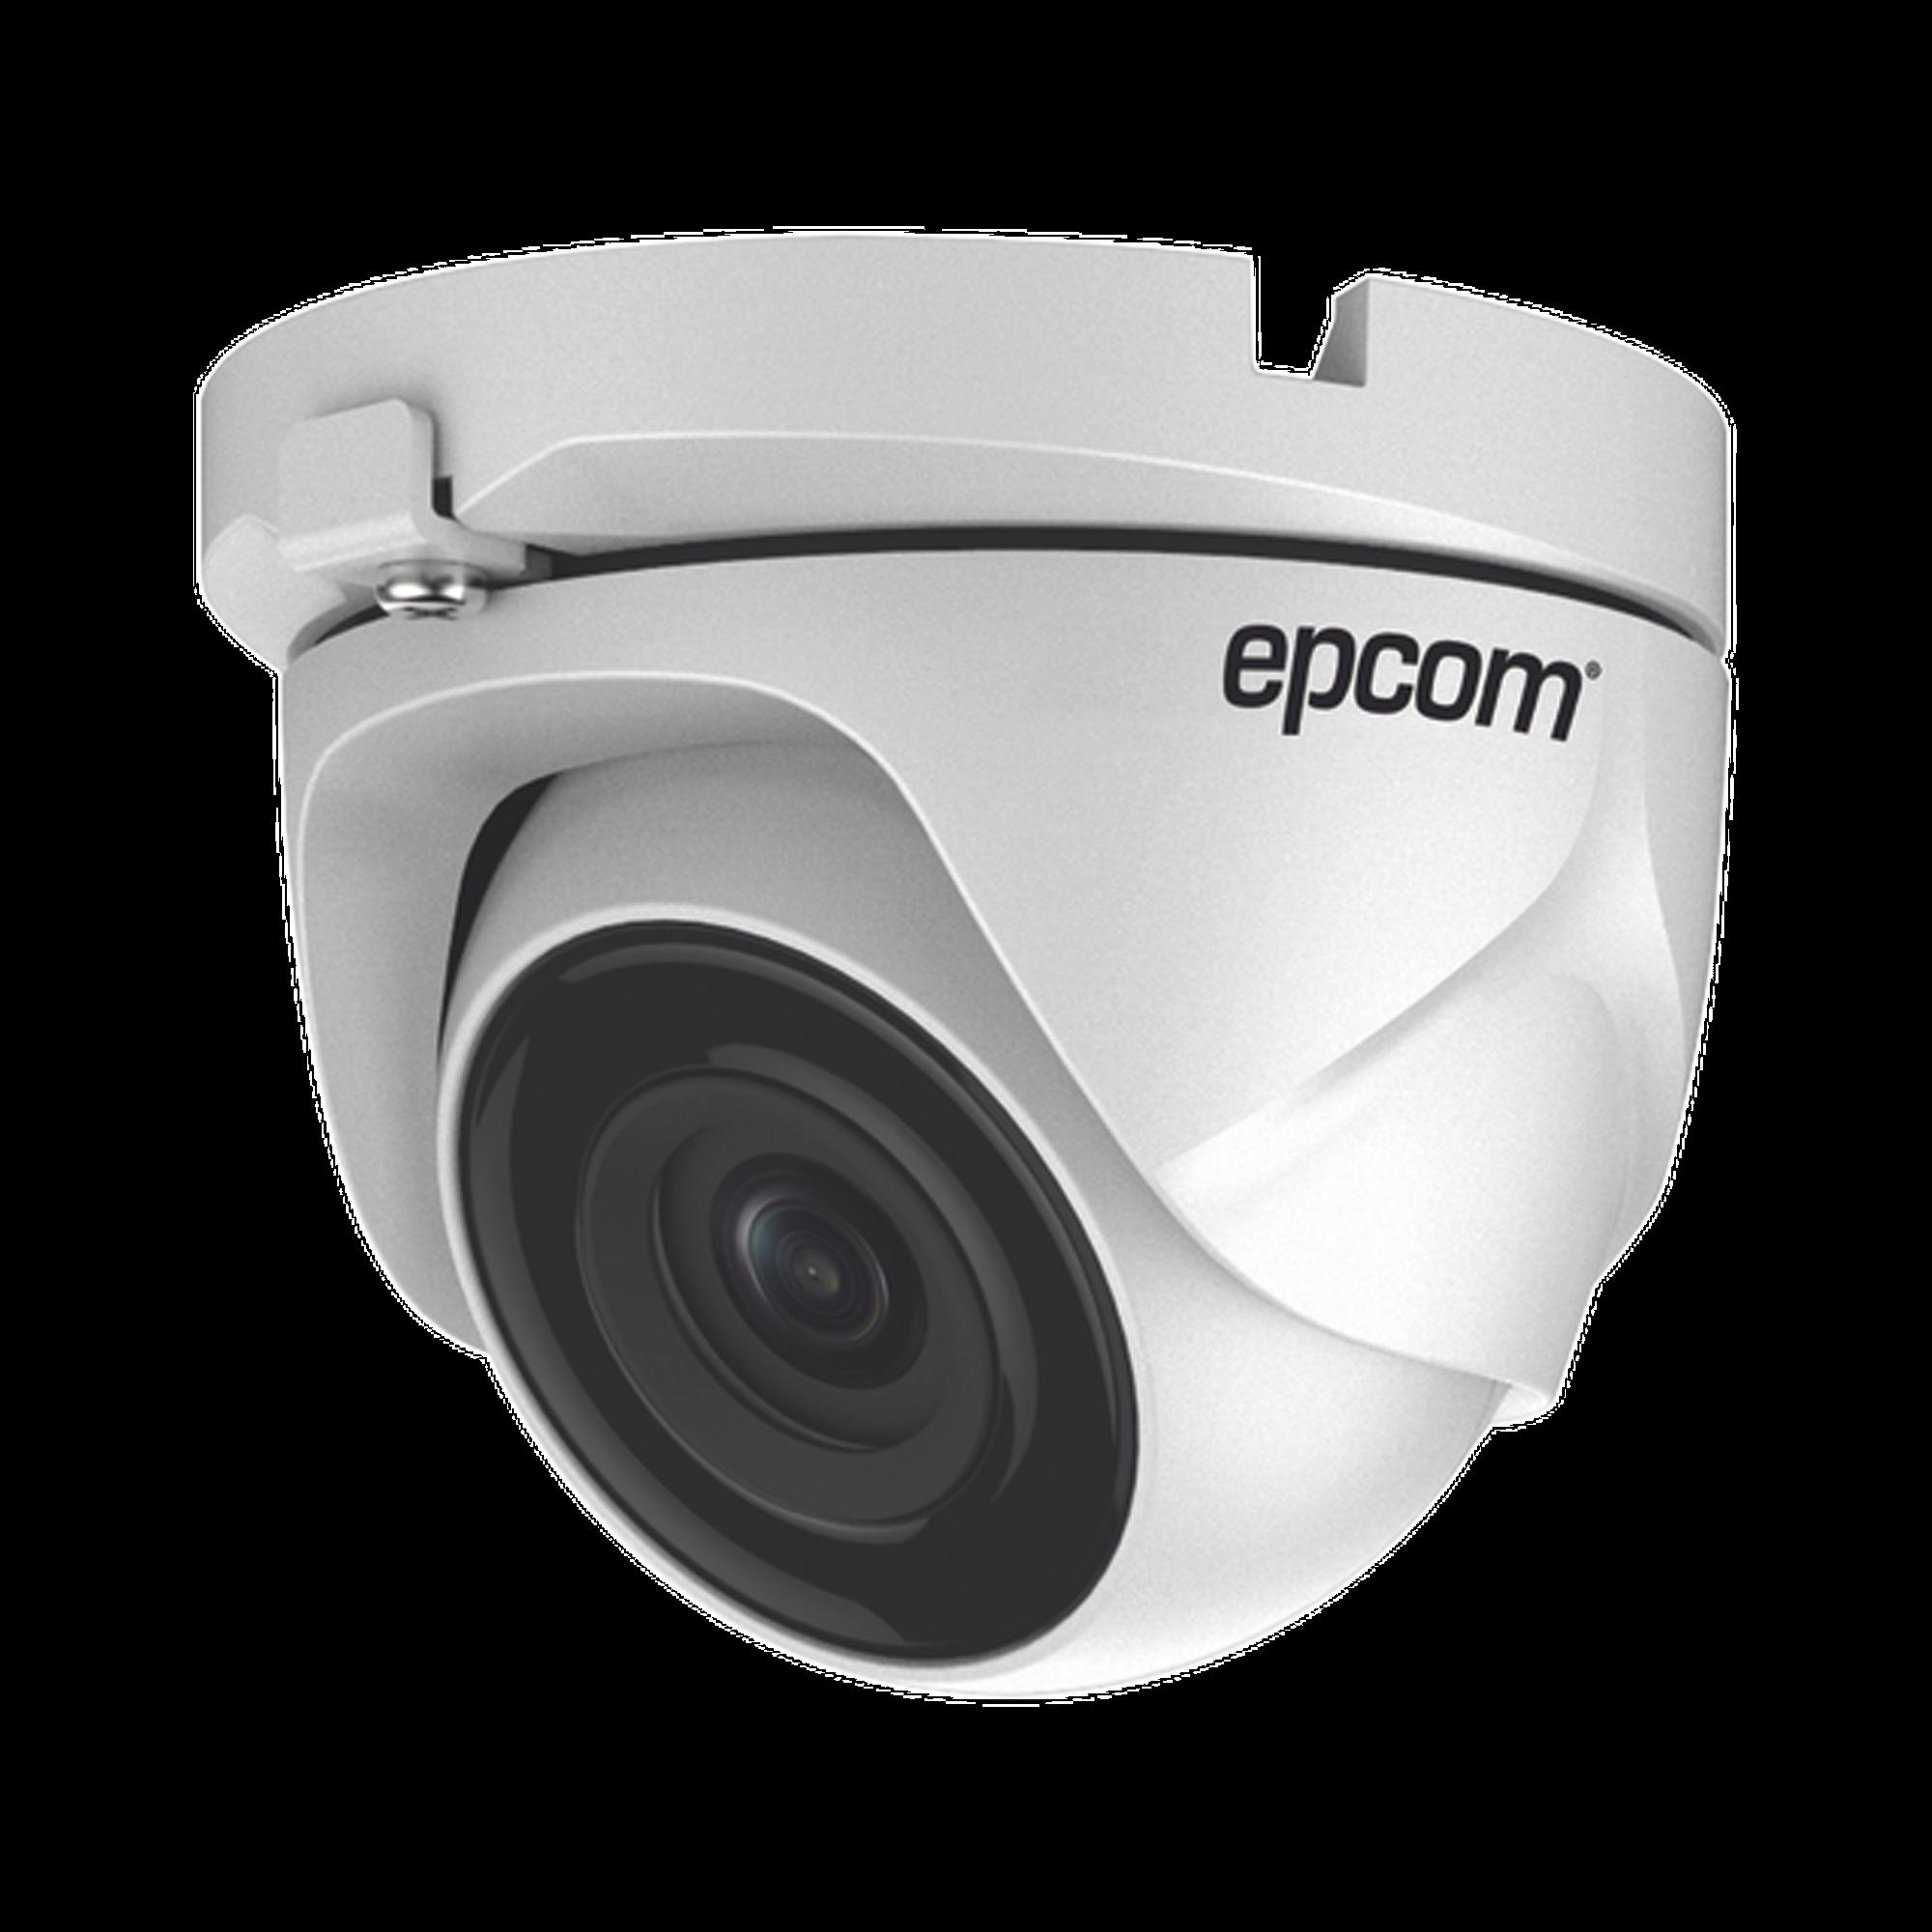 Eyeball TURBOHD 1 Megapixel (720p) / METALICA / Gran Angular 92? / Lente 2.8 mm / IR Inteligente 20 mts / Exterior IP66 / TVI-AHD-CVI-CVBS / dWDR